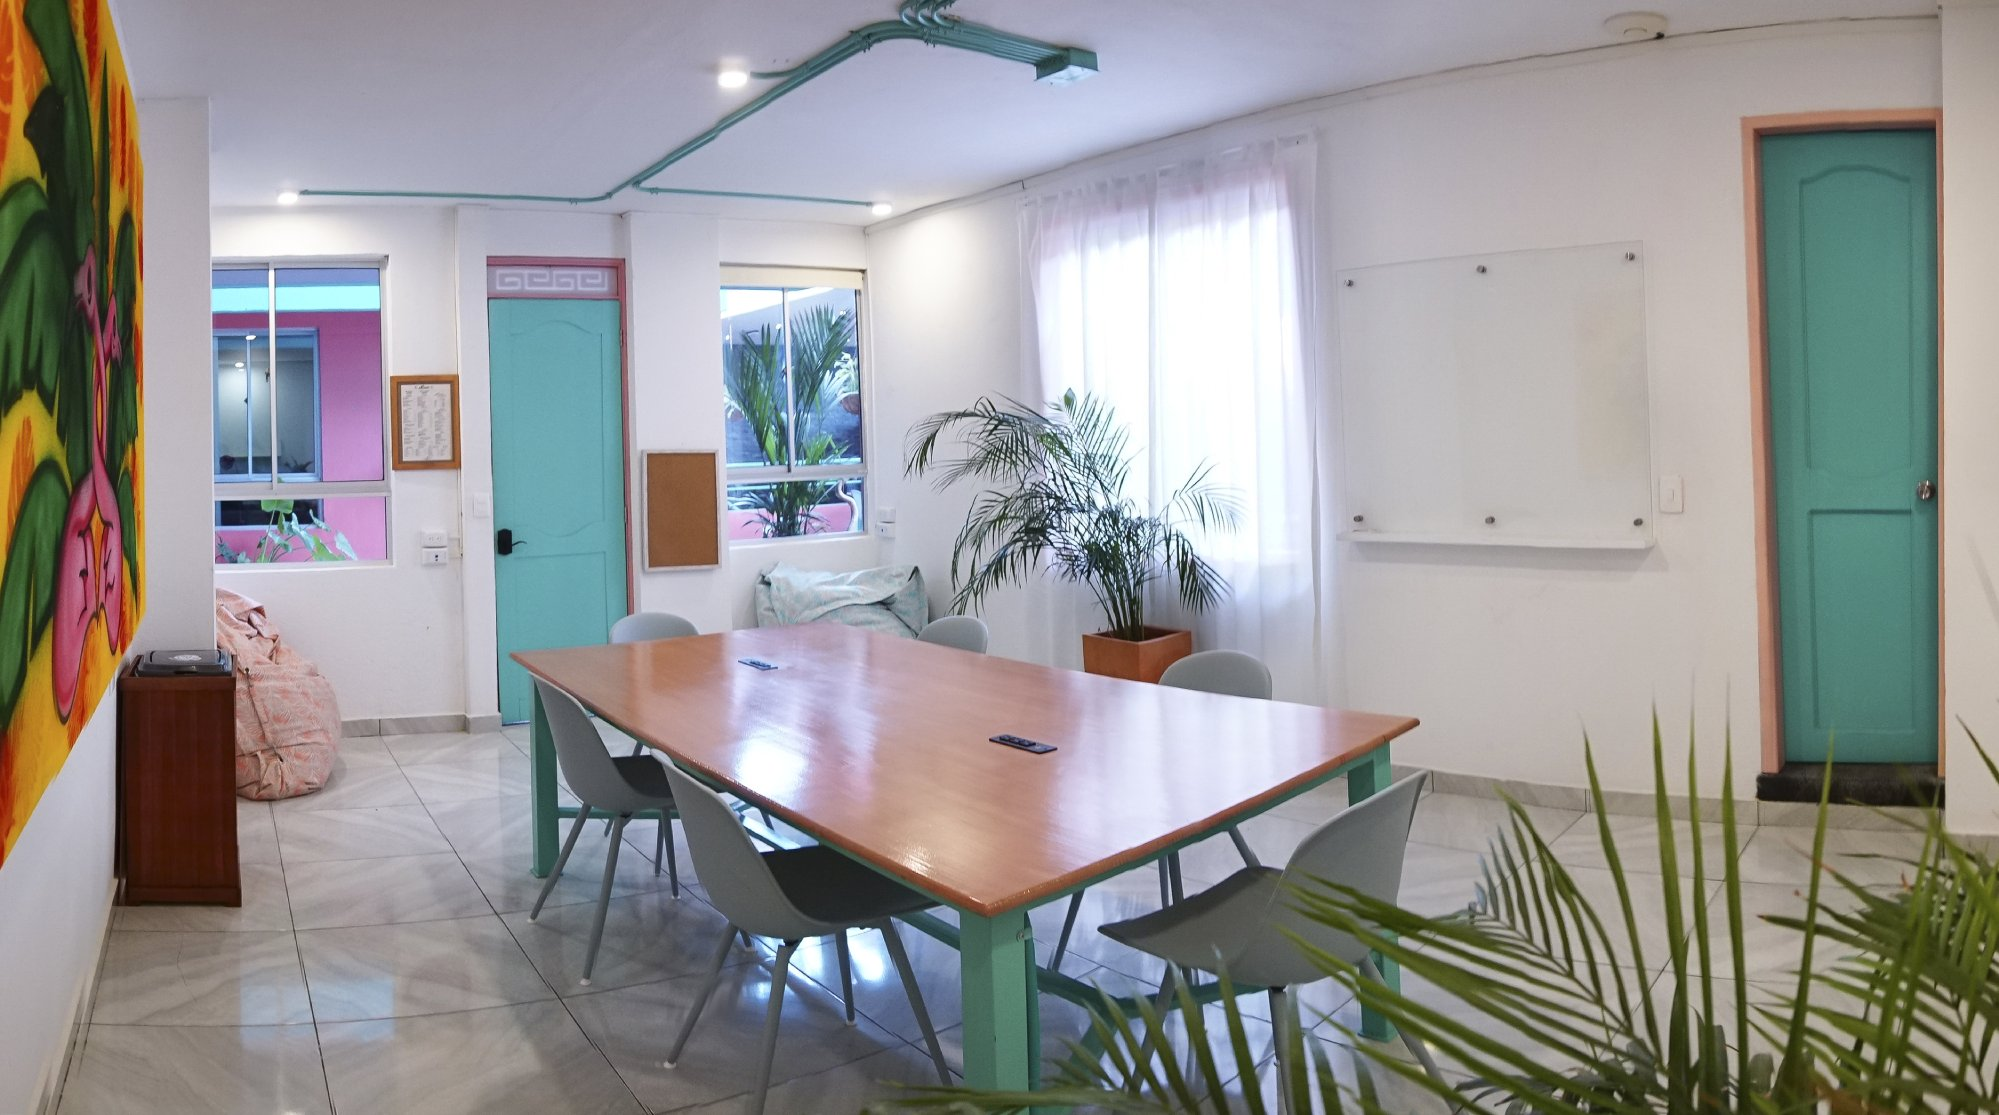 Meeting Room at Flamingo Coworking in Santa Marta Colombia